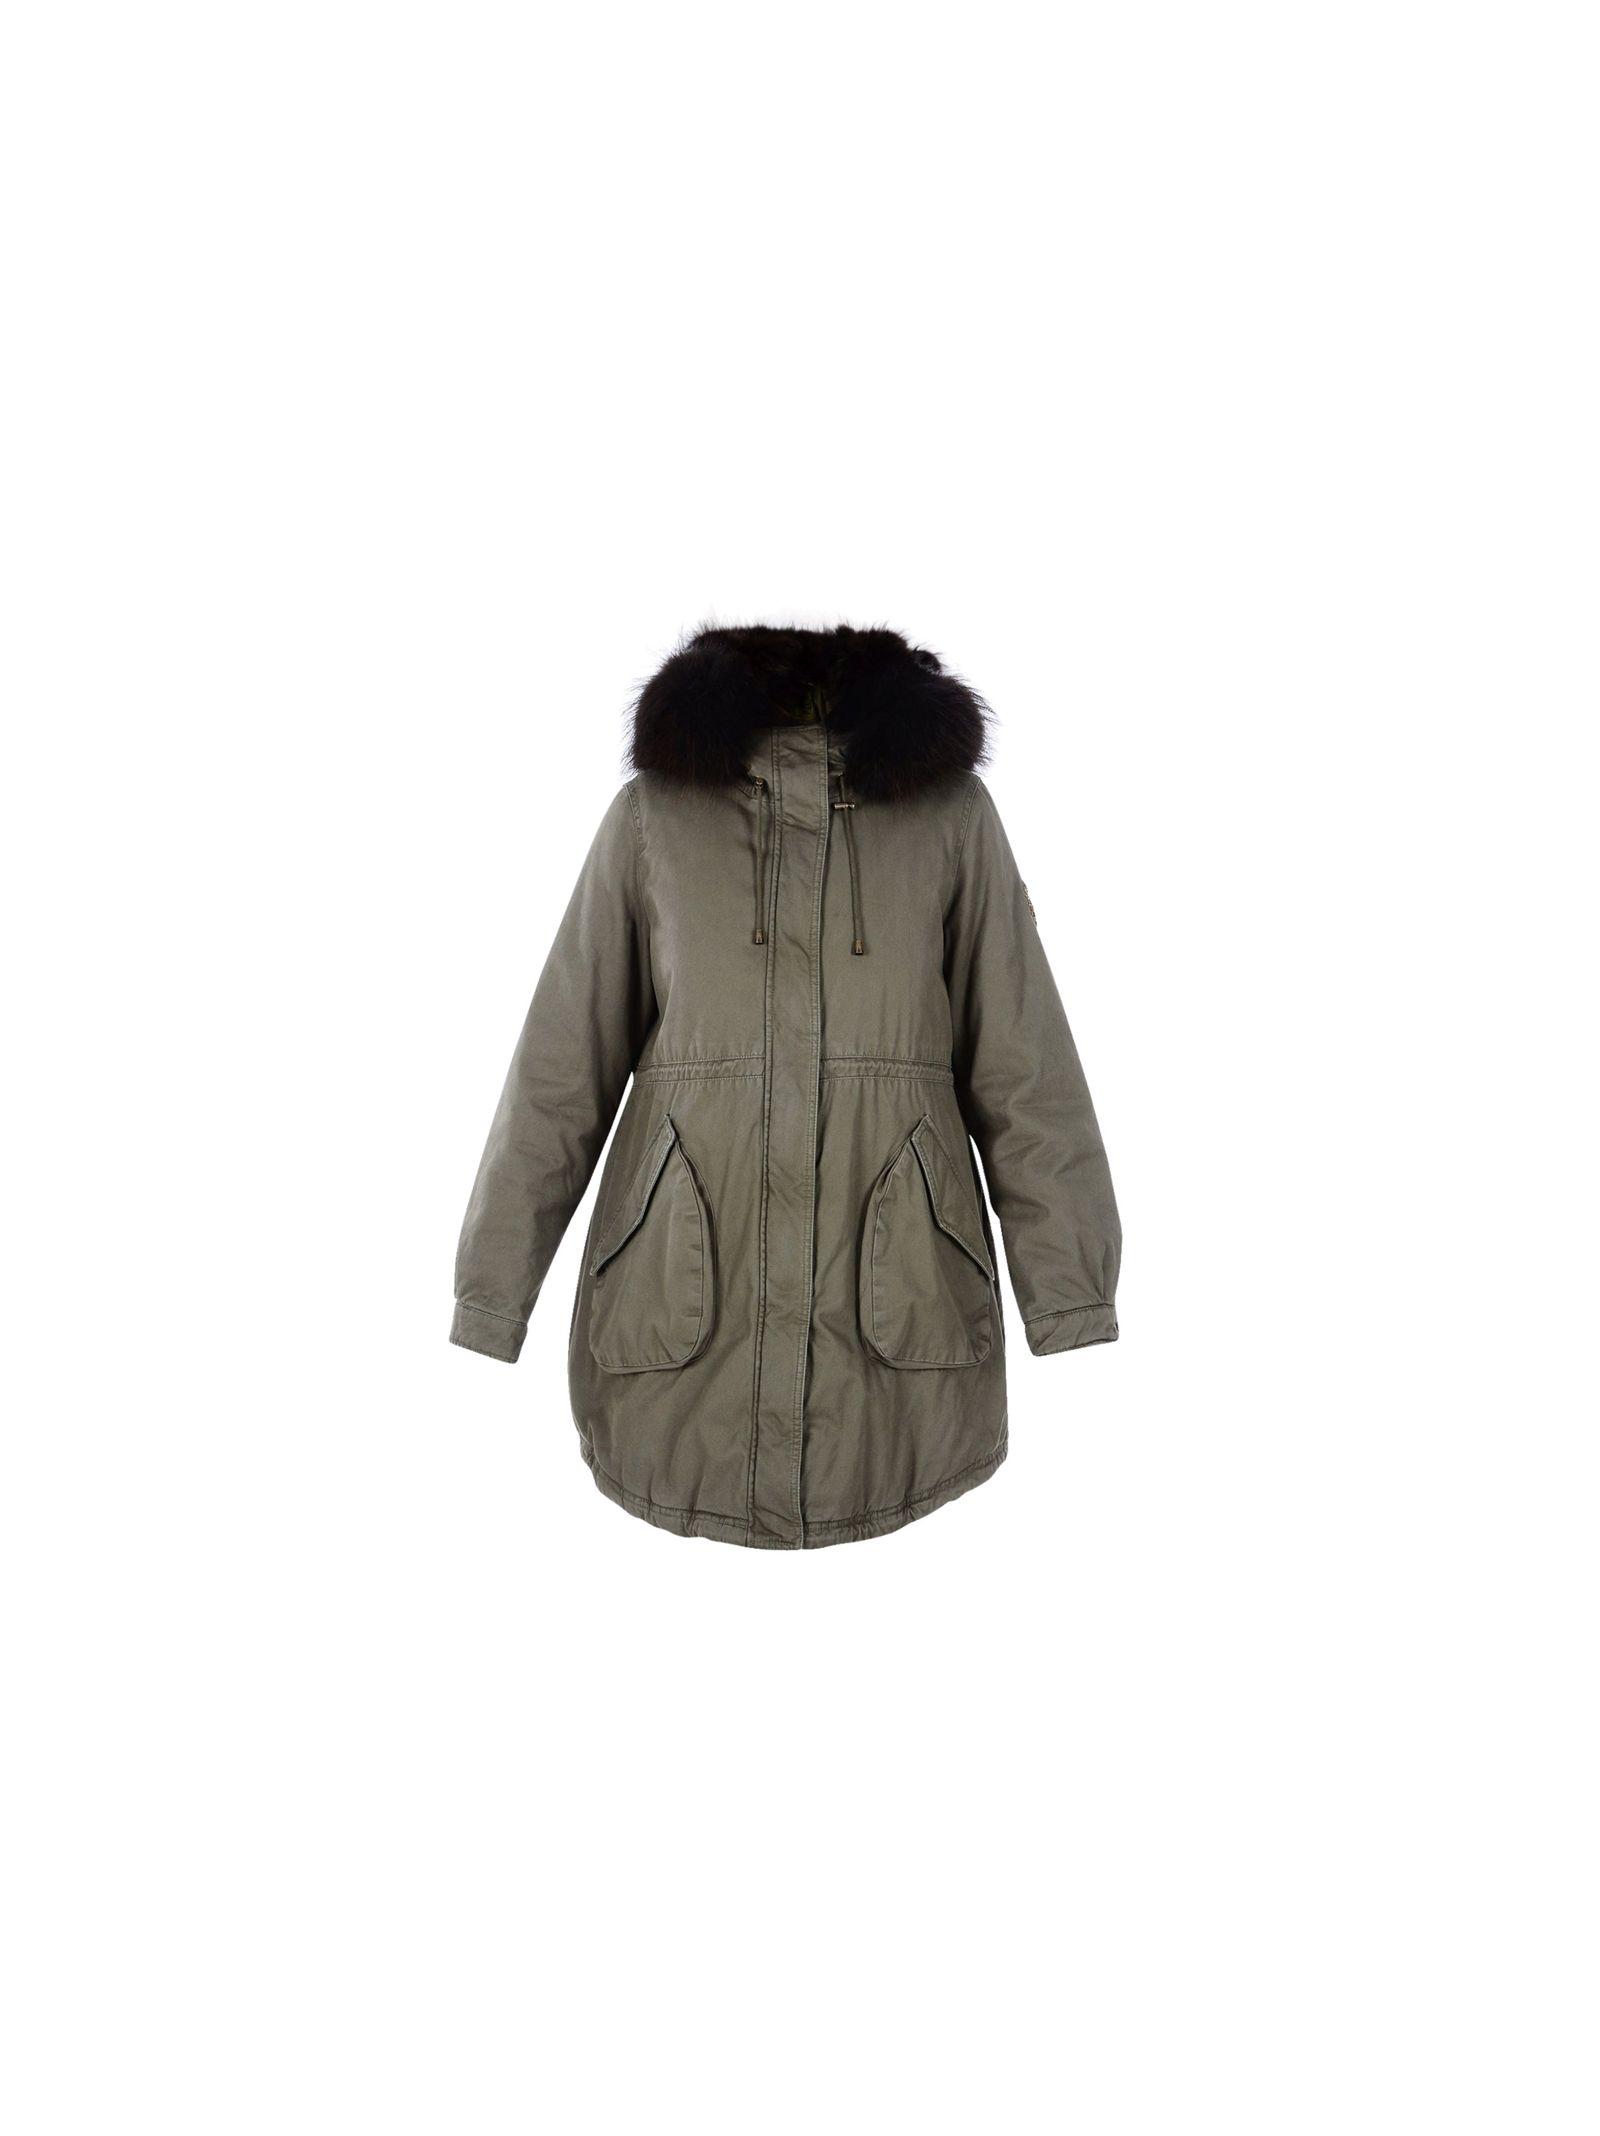 Alessandra Chamonix Fur Cotton Parka Coat